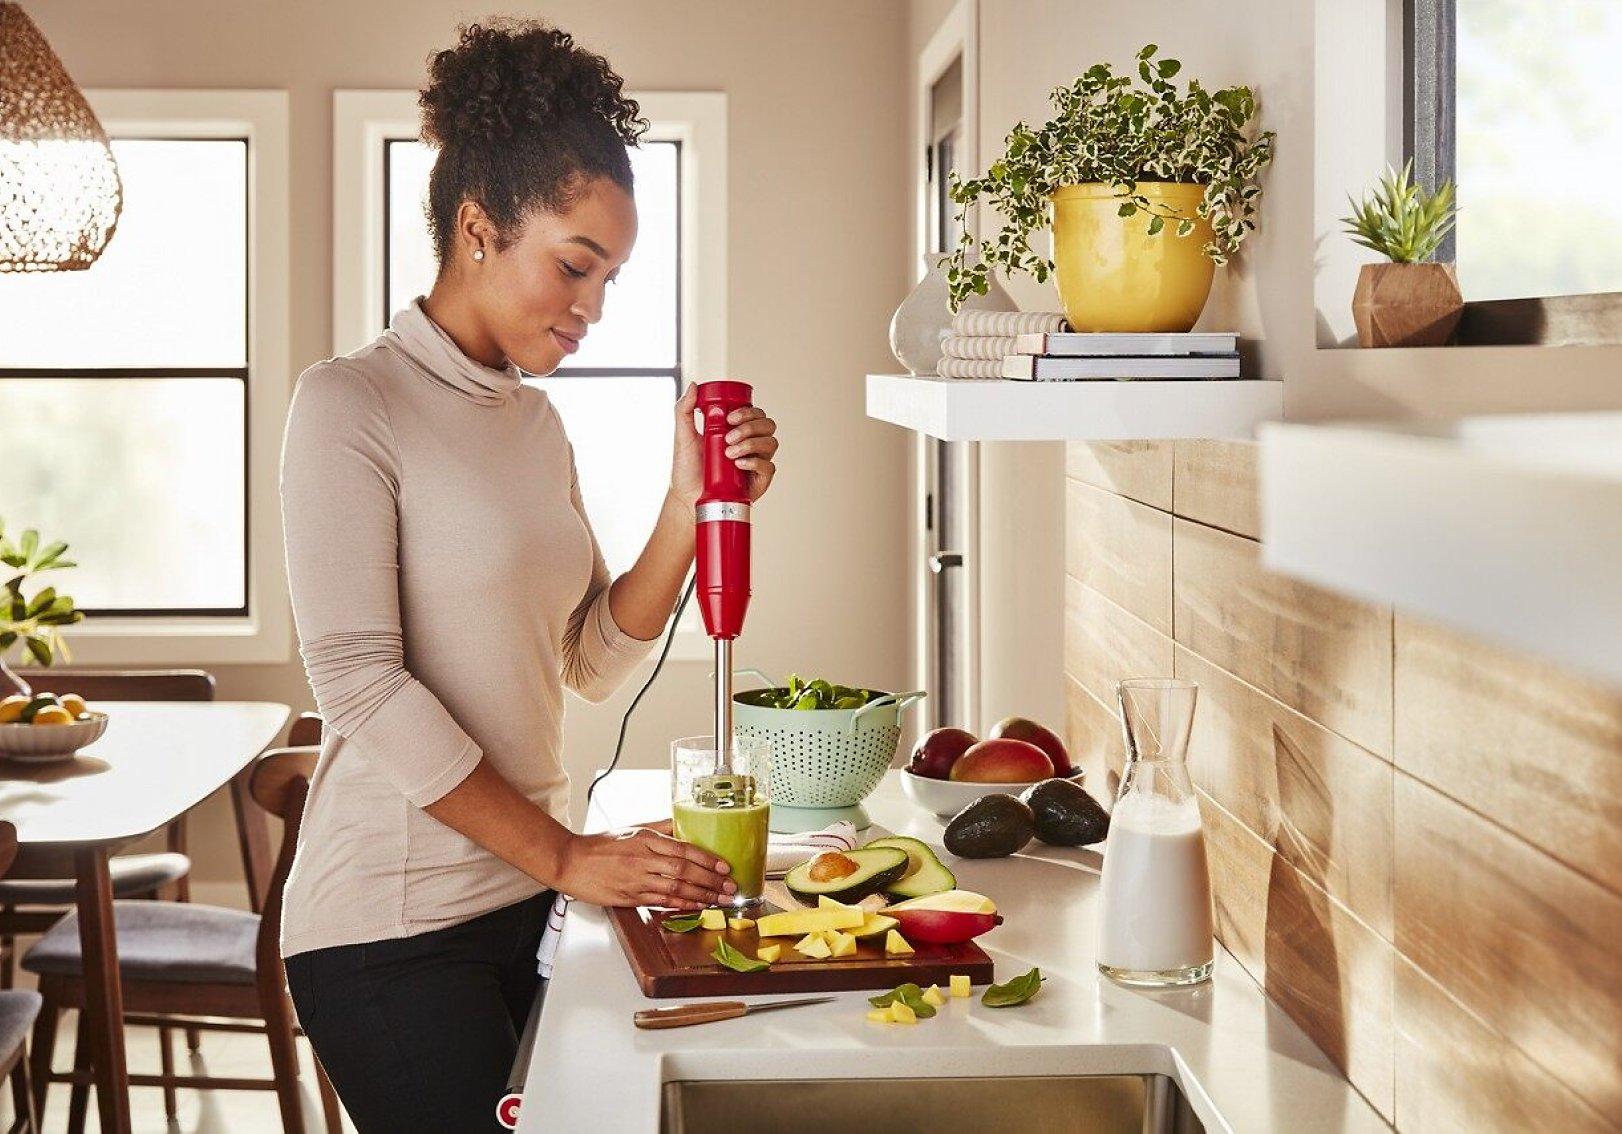 Making an avocado smoothie using a KitchenAid® hand blender.